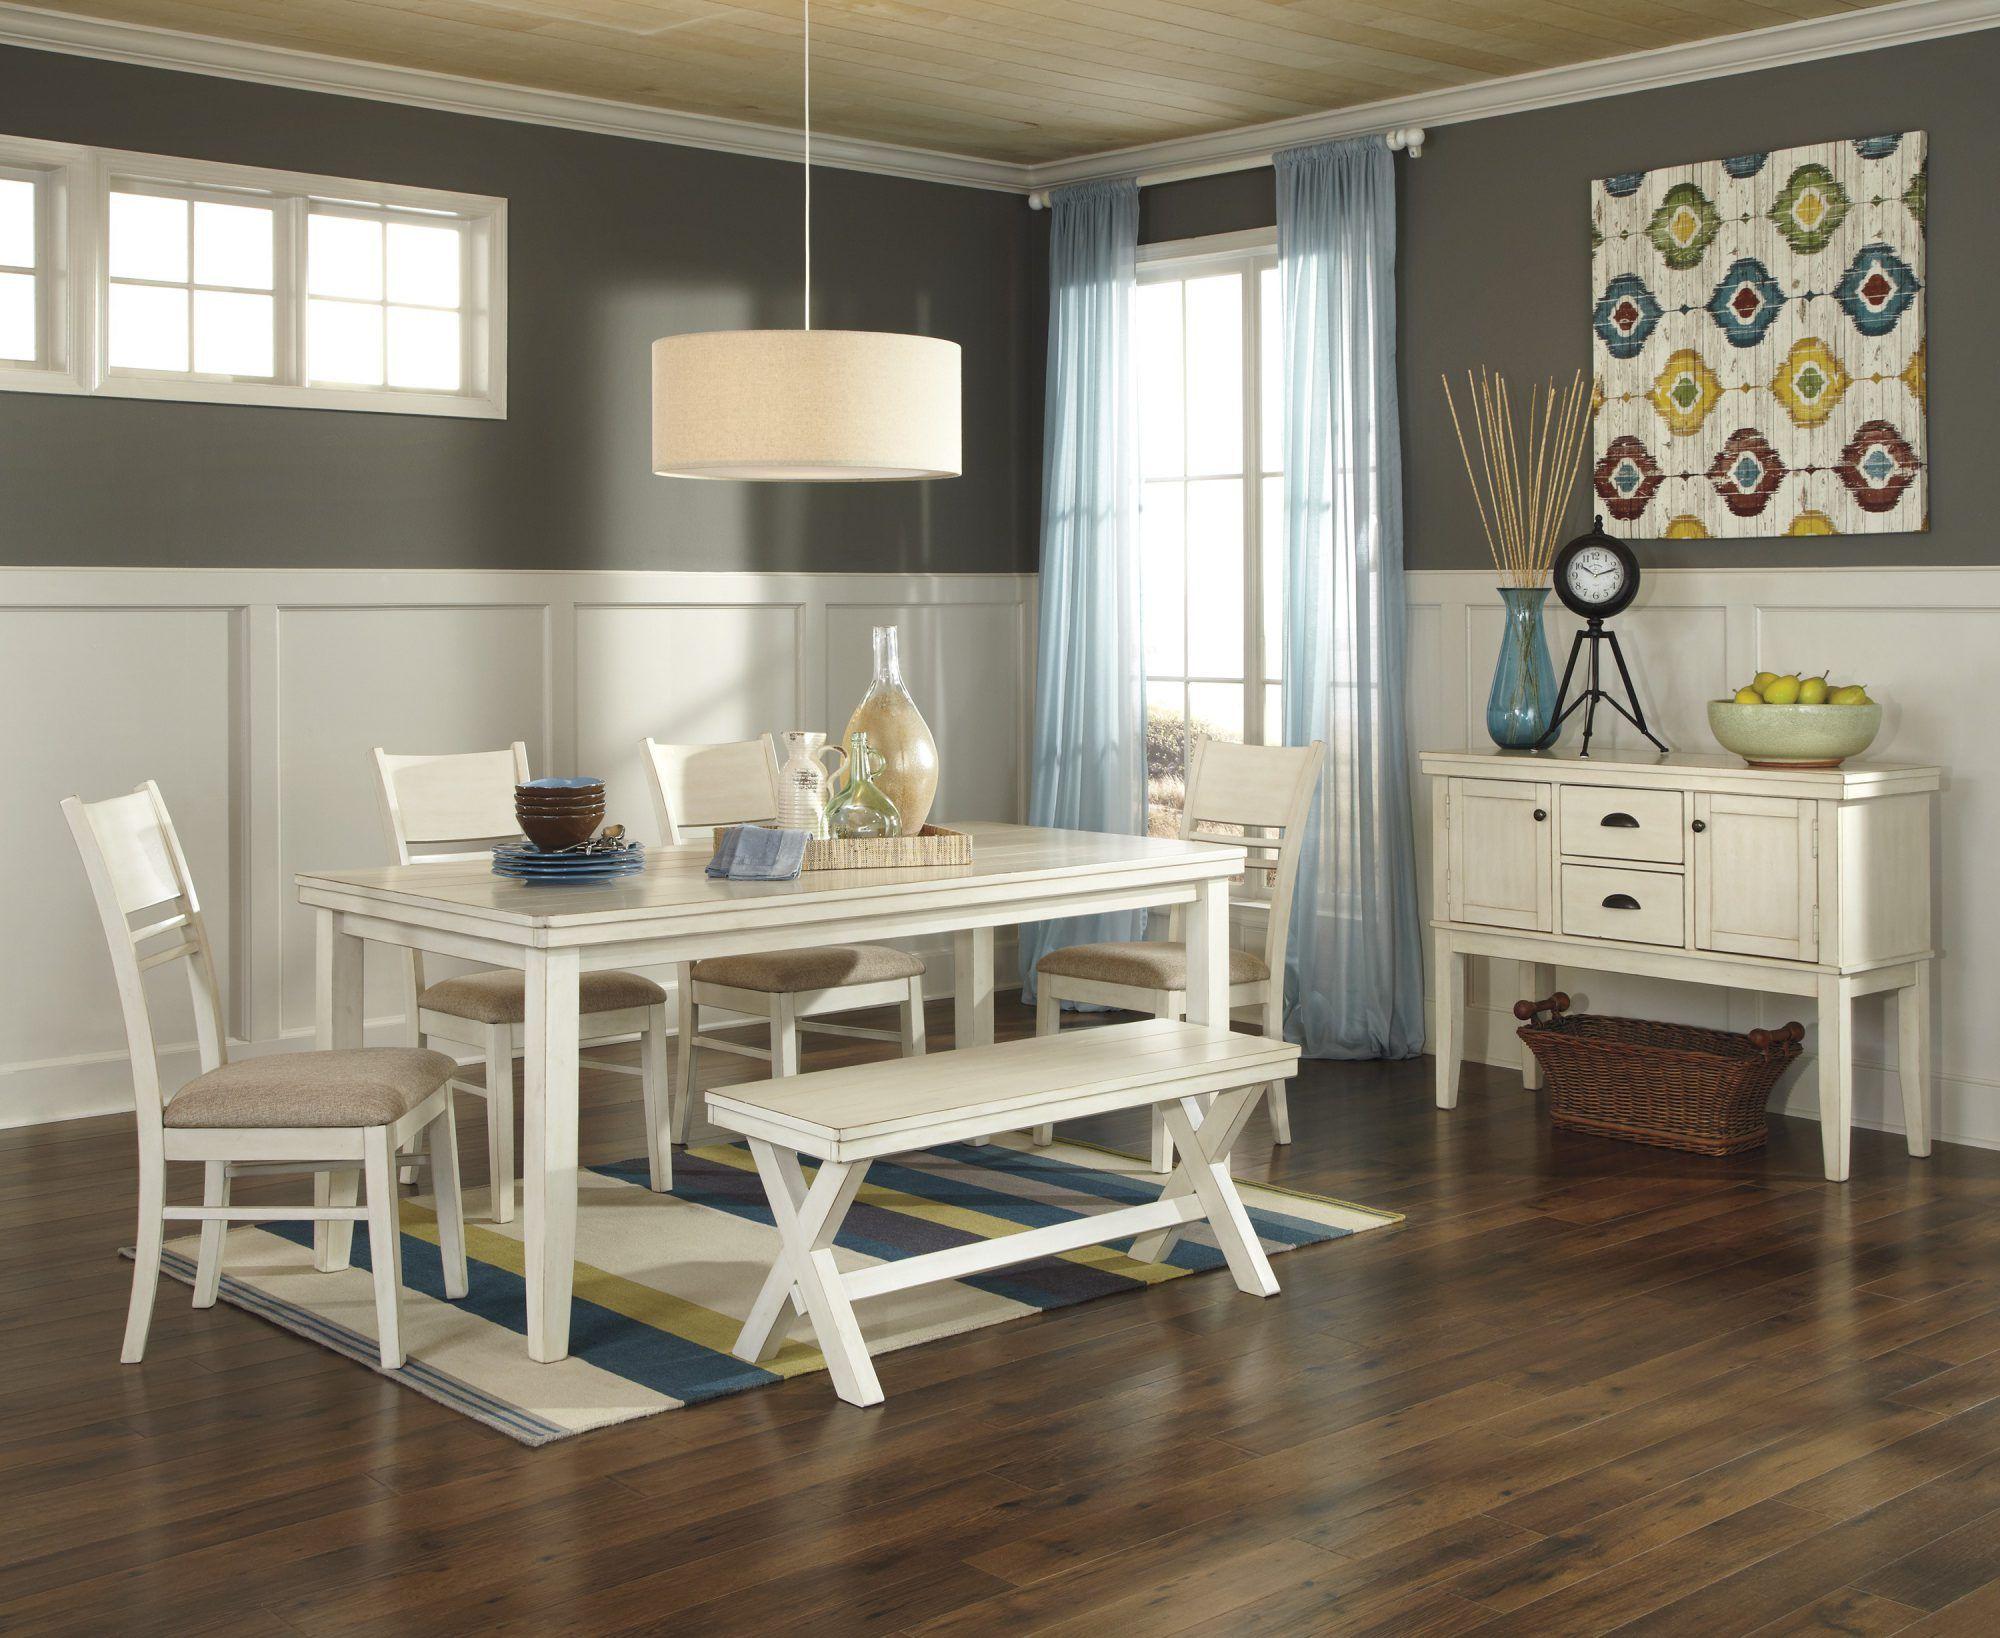 casual dining room window treatments modern interior design ideas ...